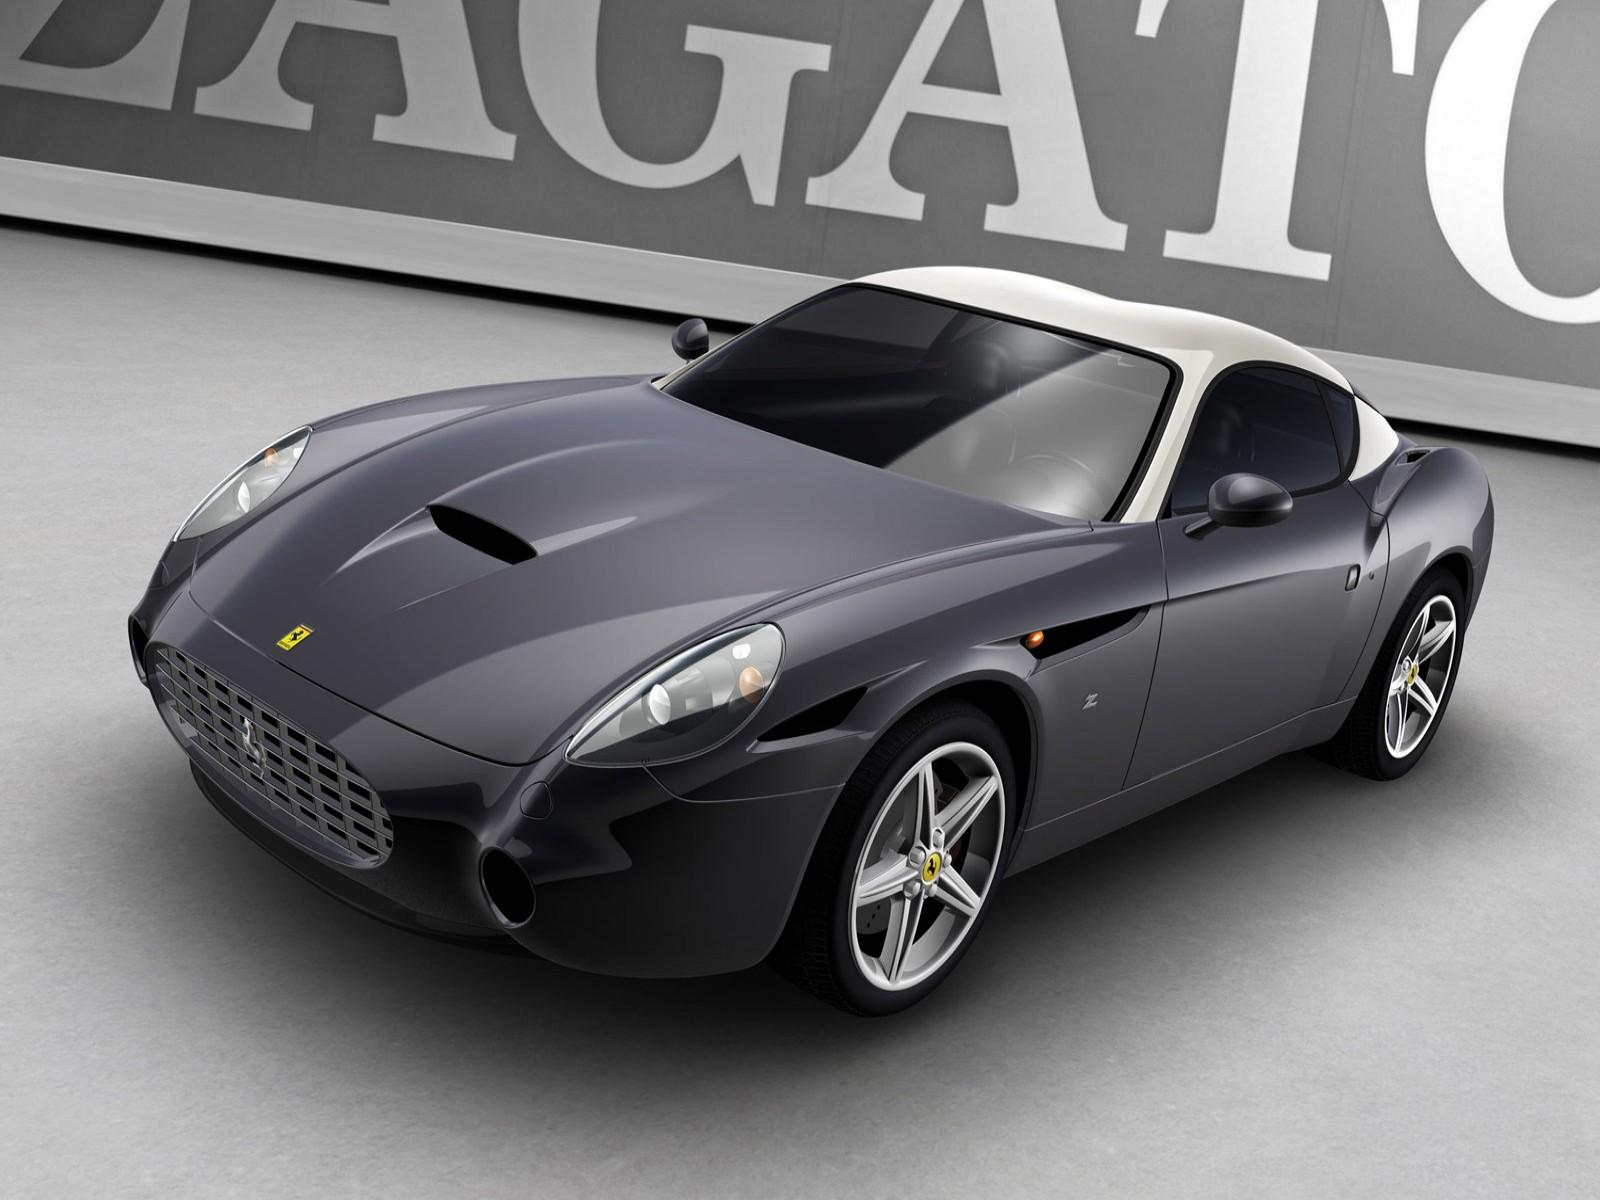 http://3.bp.blogspot.com/-JcNfobK3V1E/TlP2ZgbVcrI/AAAAAAAAD1M/TZ2wOa_3-go/s1600/Ferrari+575+GTZ+Zagato+2006+05.jpg